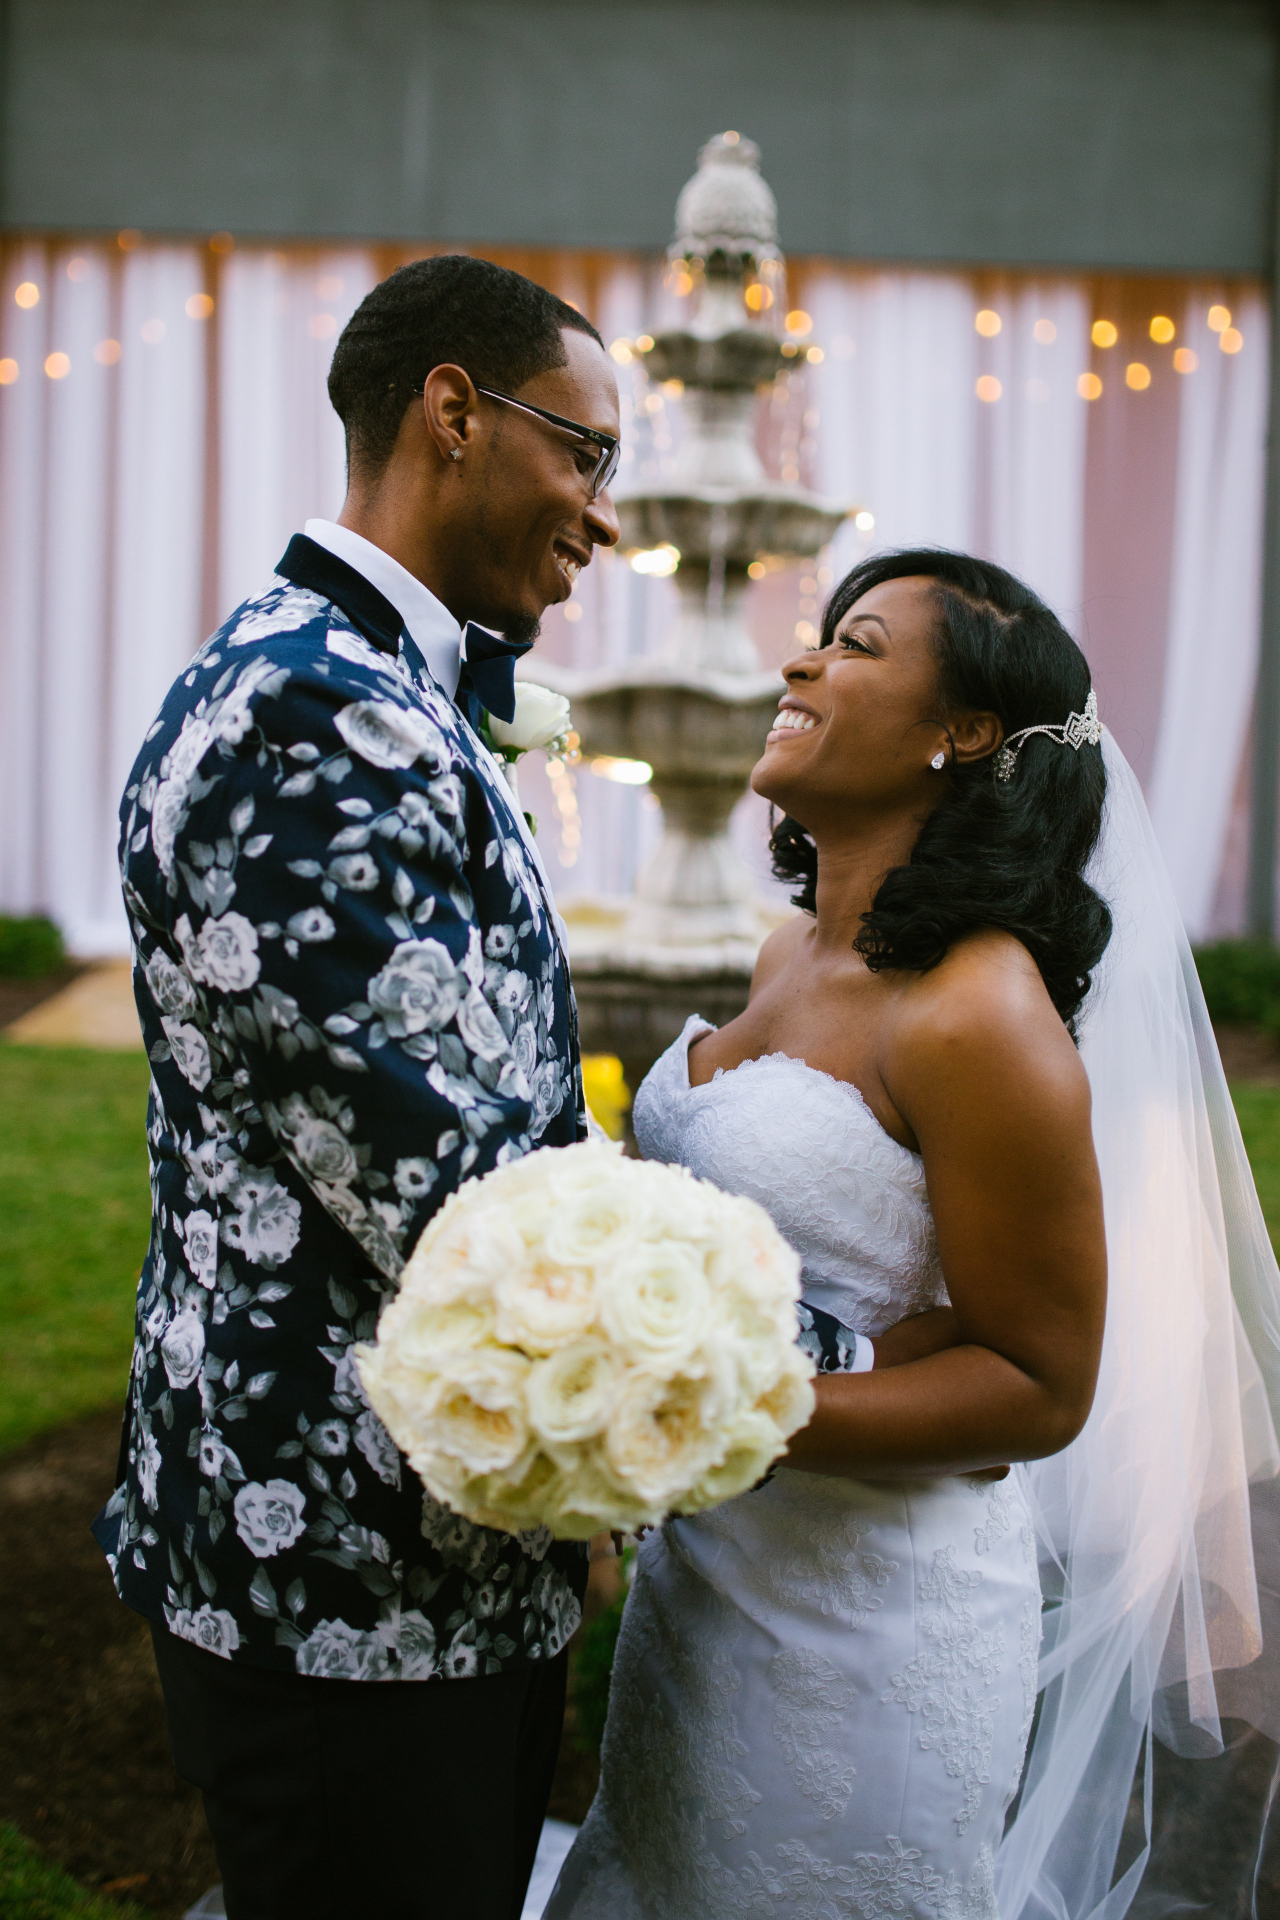 The Brooks Wedding-T2r3Z244582399.jpg